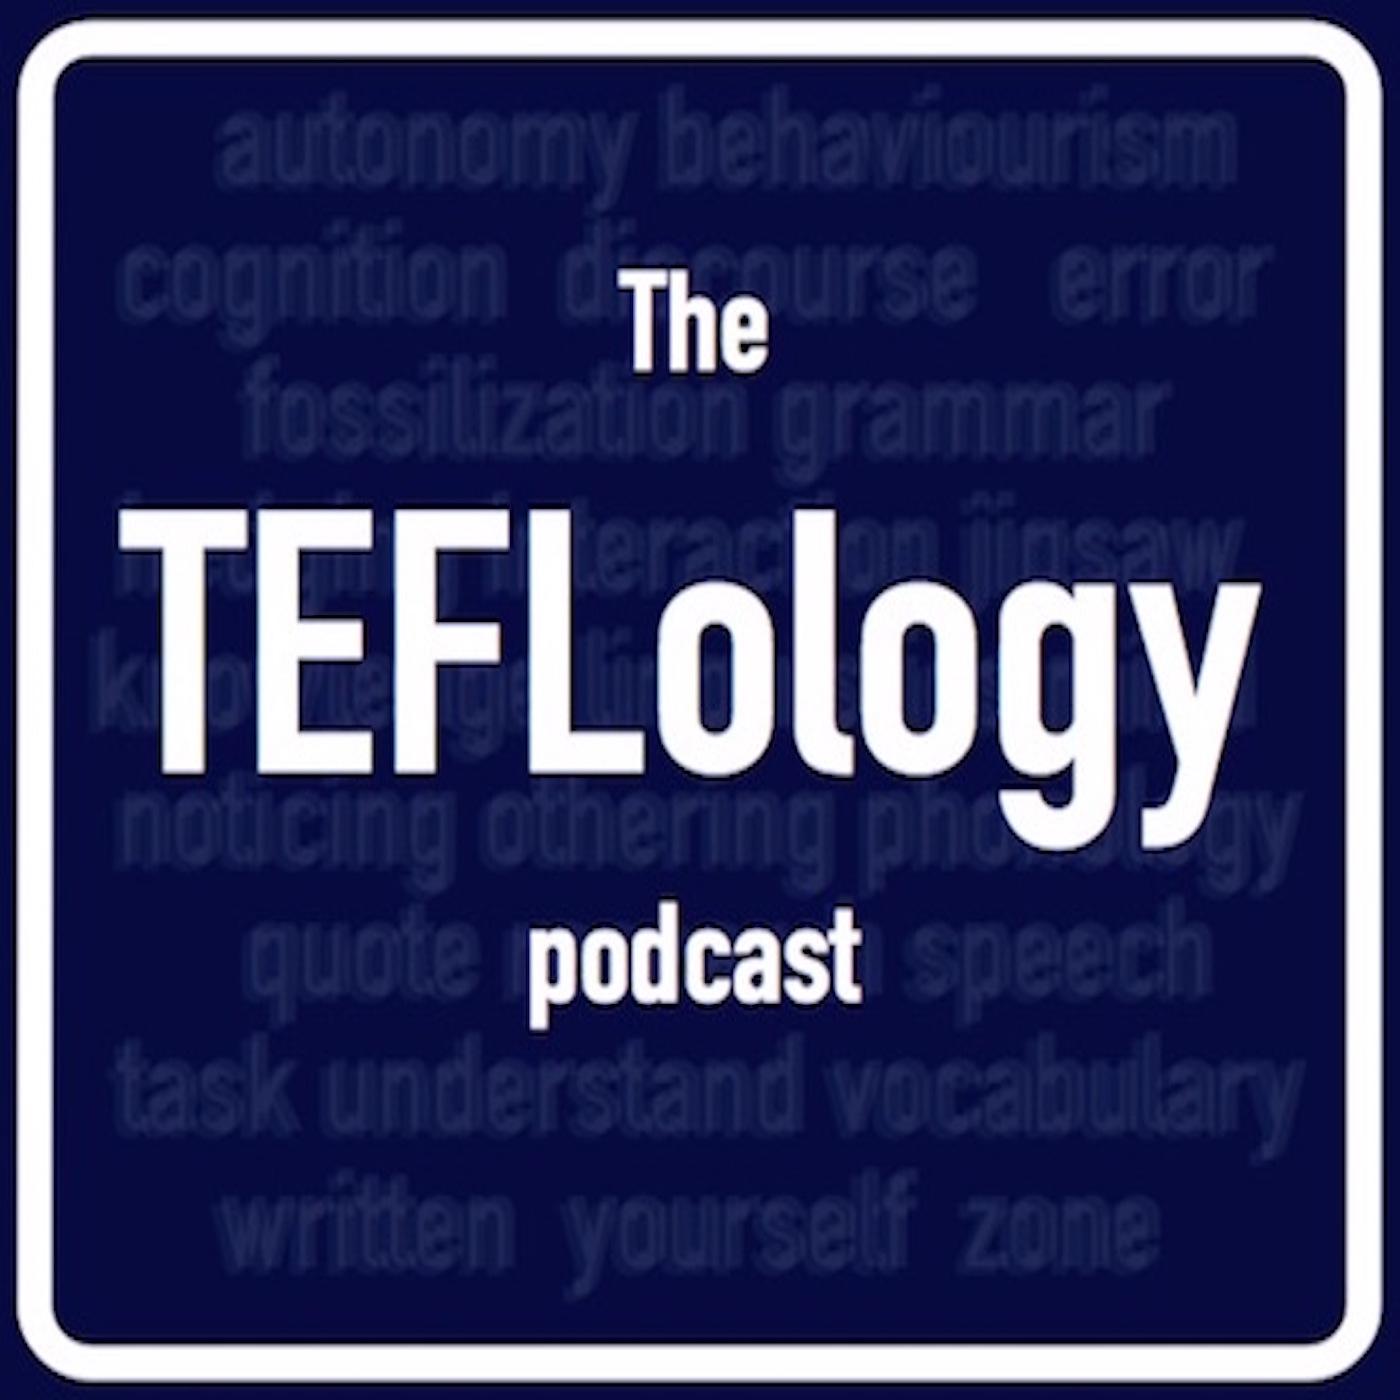 BONUS Episode 55: A Duoethnography by Marek Kiczkowiak & Robert Lowe